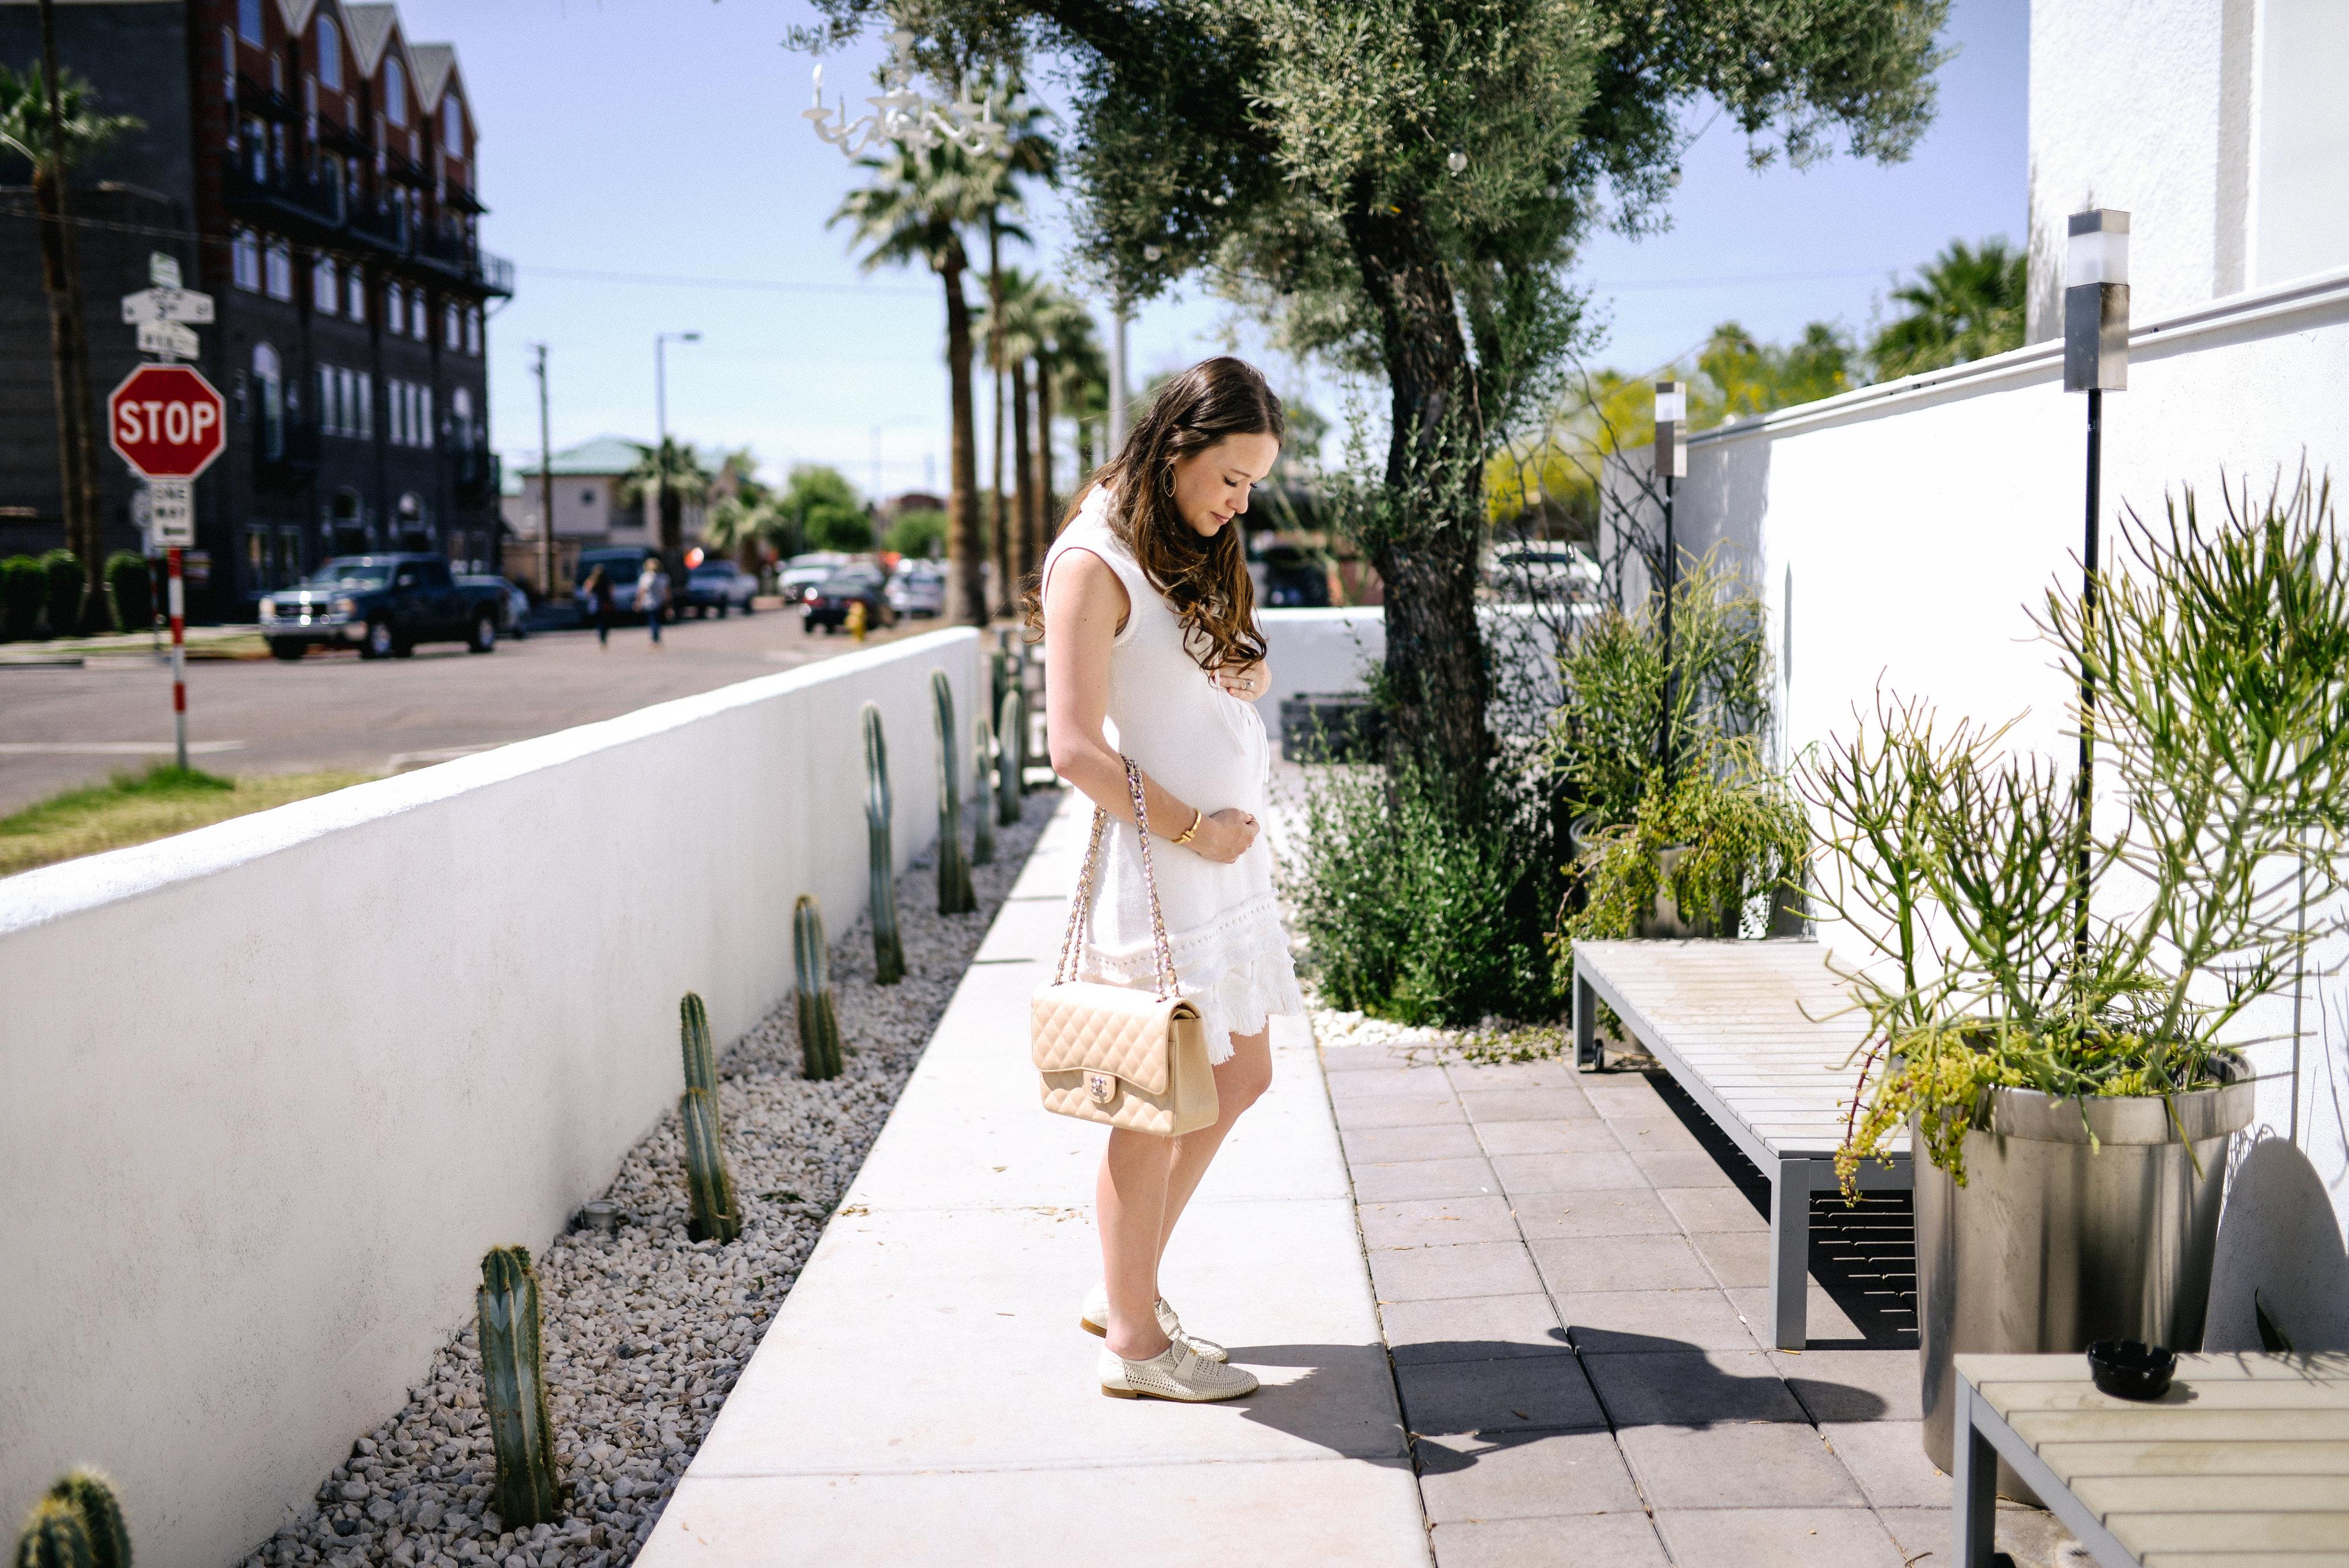 Nanette Lepore White Dress- Call me Lore